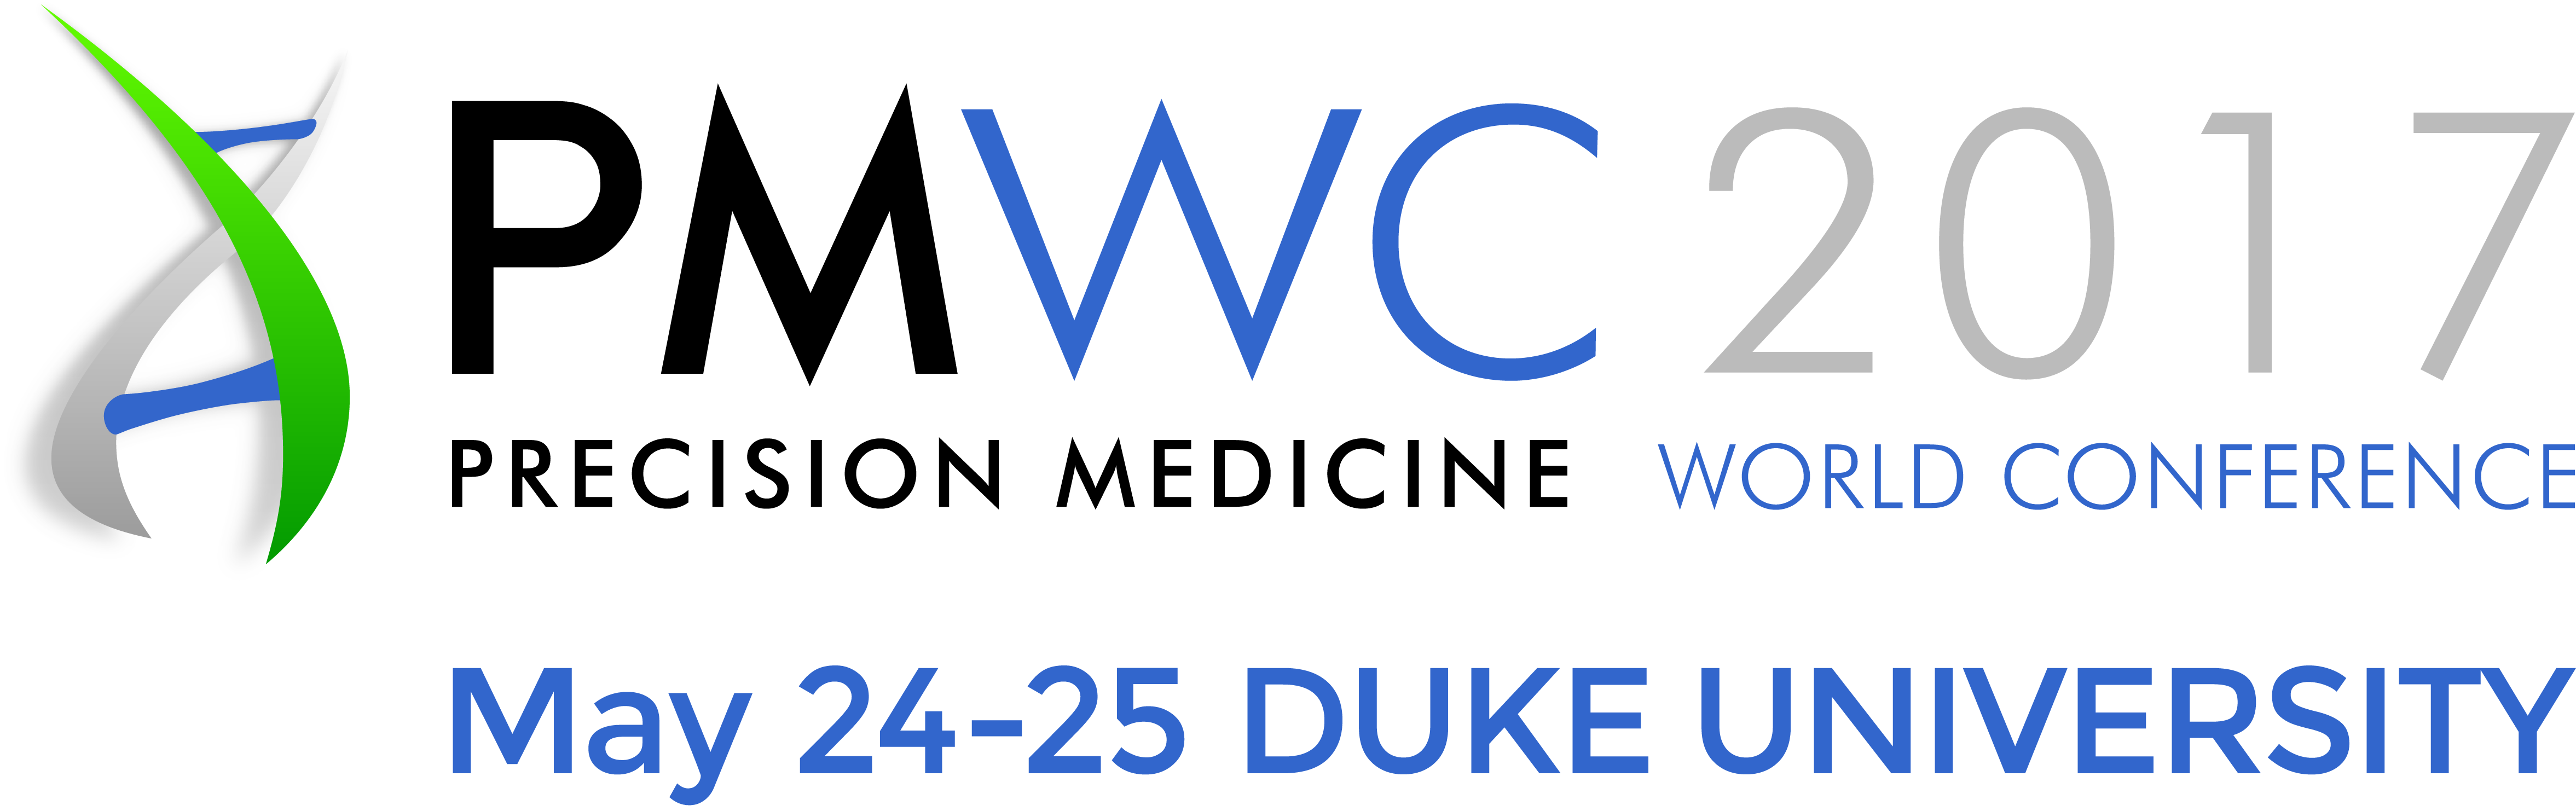 PMWC 2017 May 22-25, Duke